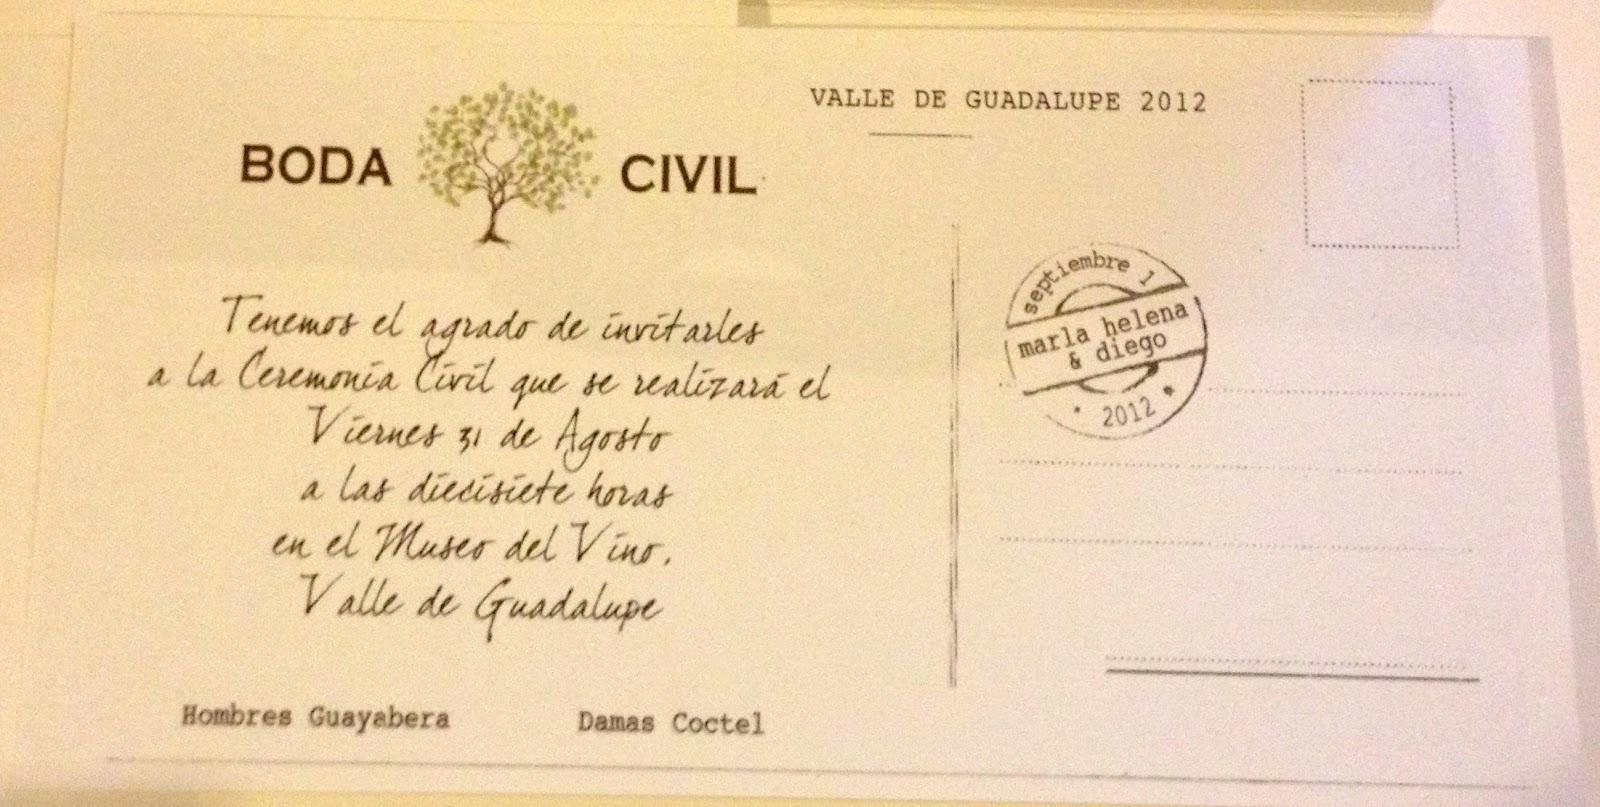 civil wedding invitation card Wedding Awesome